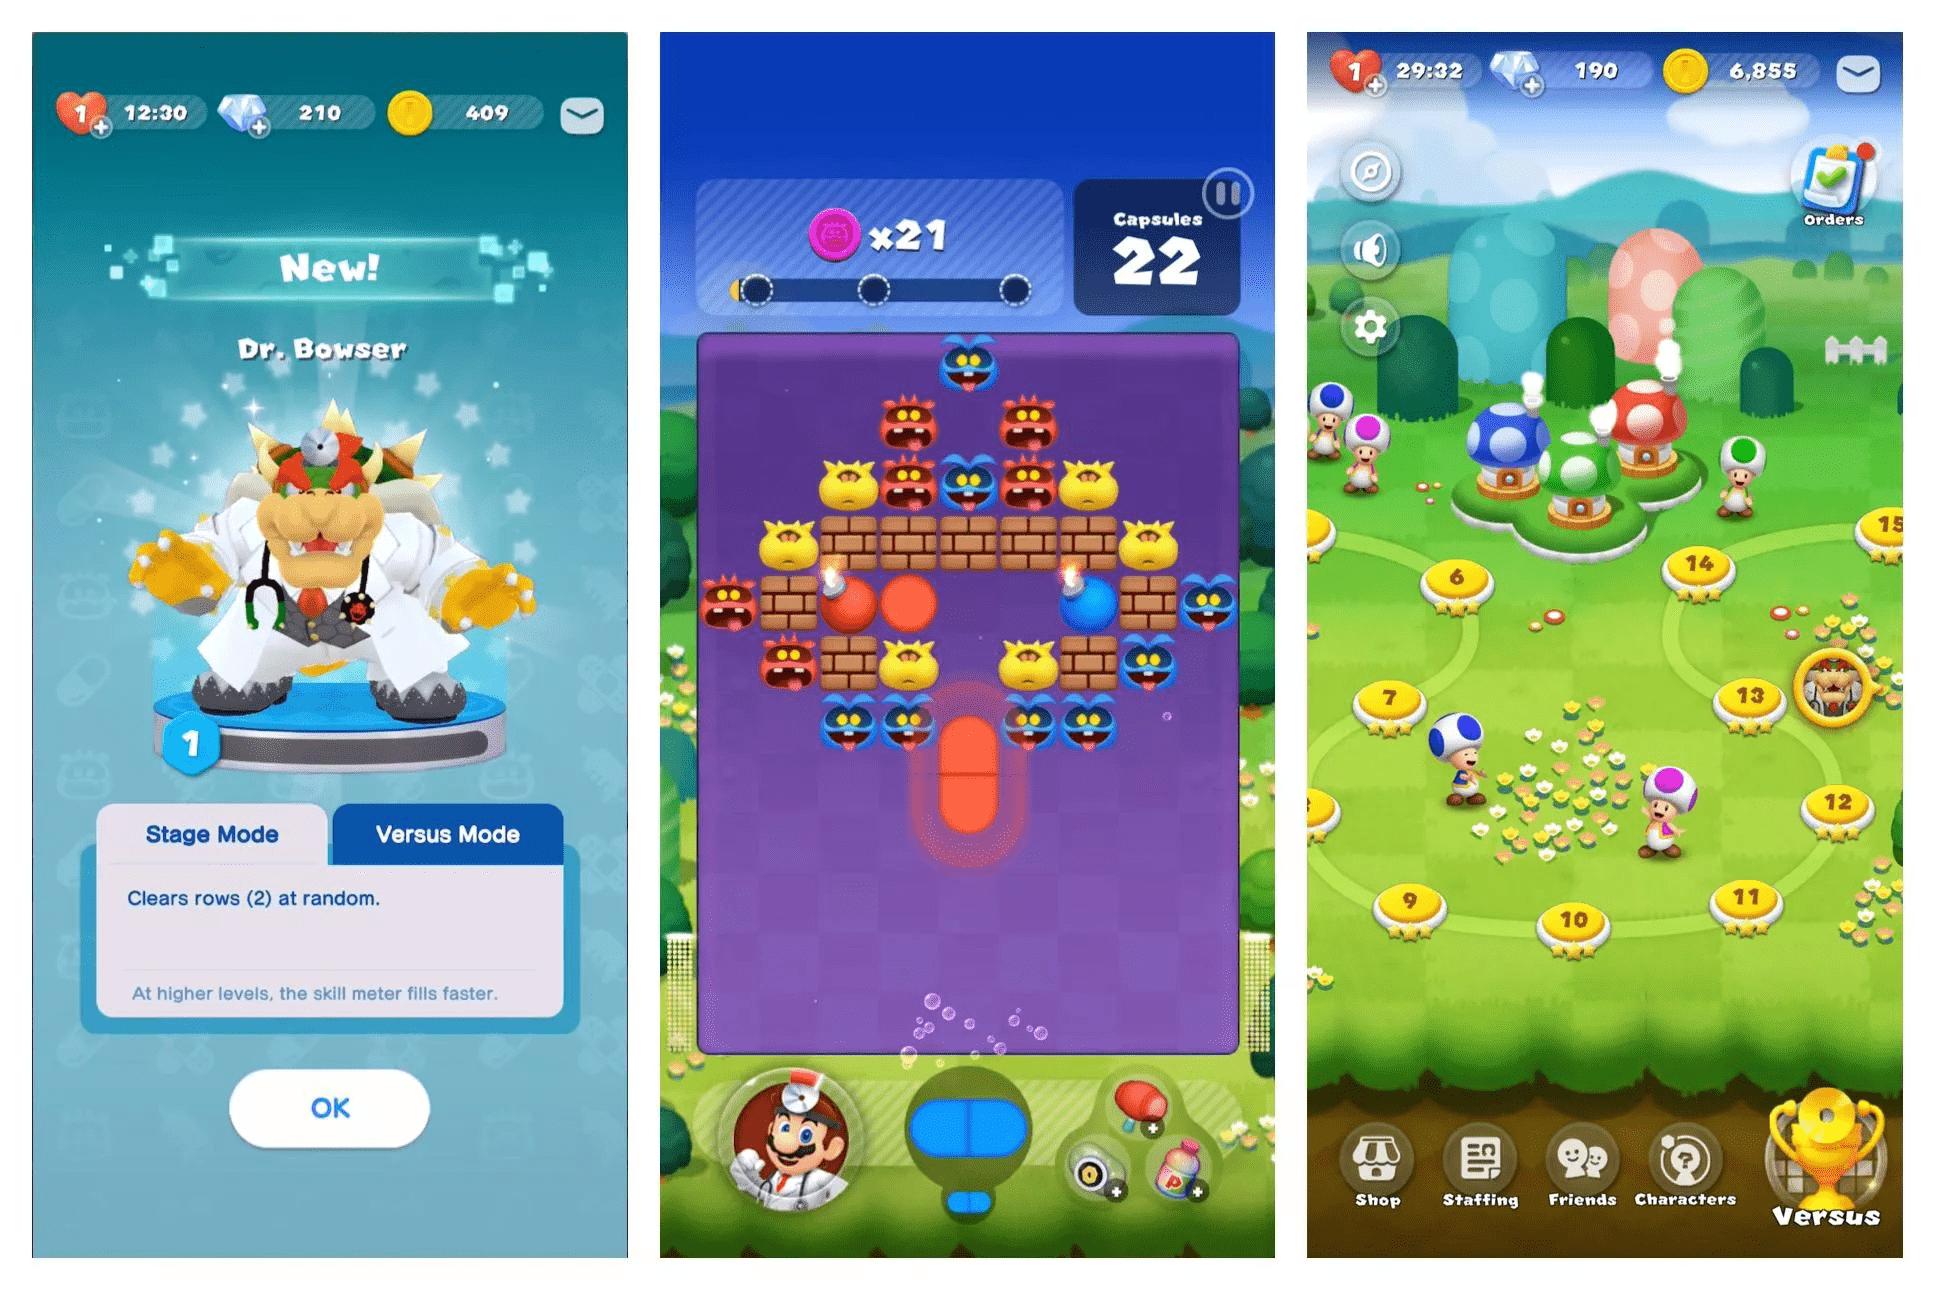 Dr. Mario World Screenshot 1